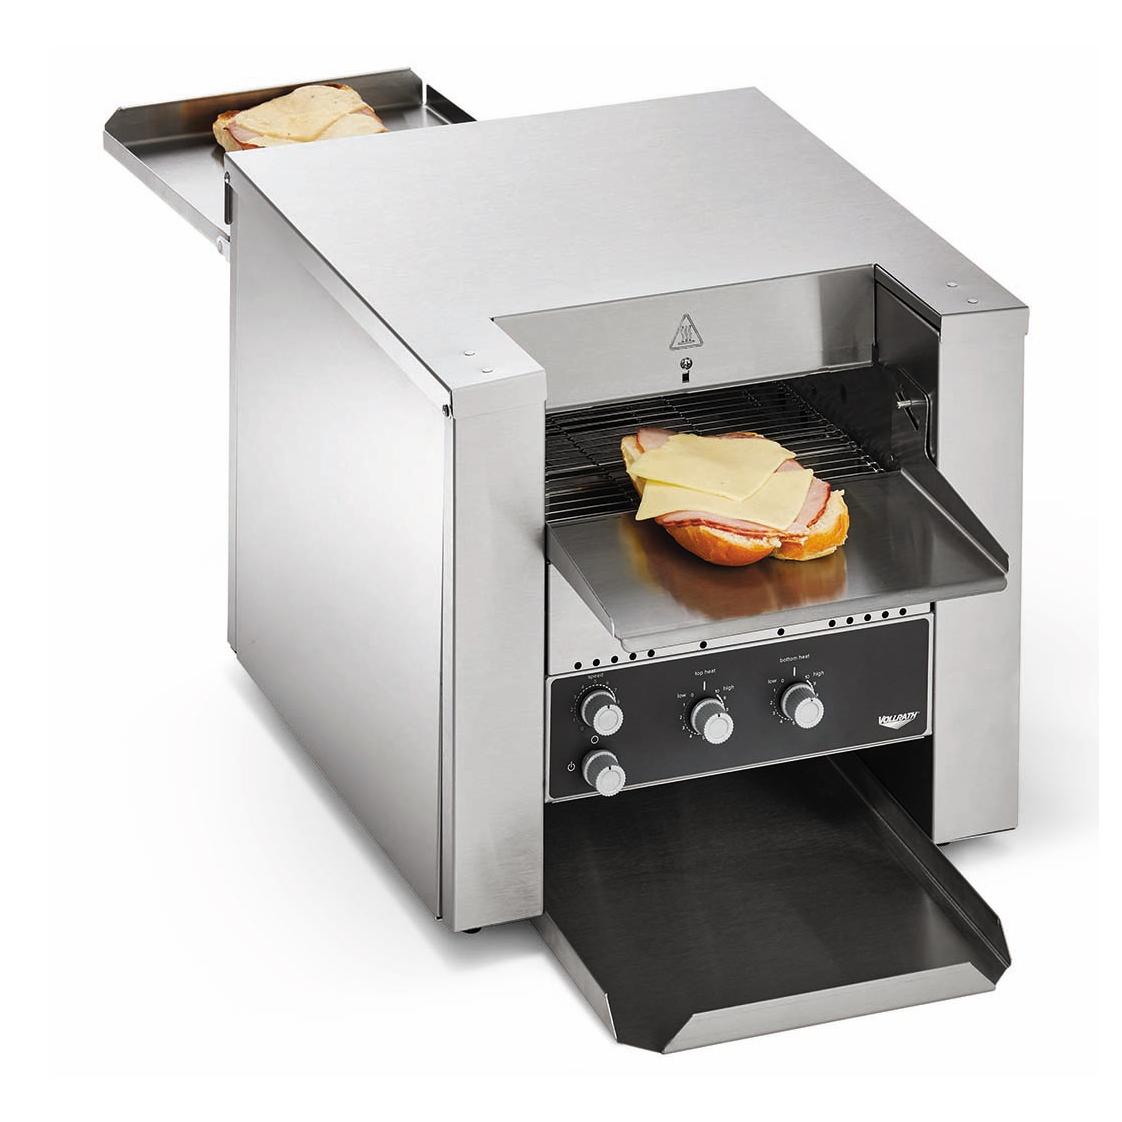 Vollrath CVT4-220550 toaster, conveyor type